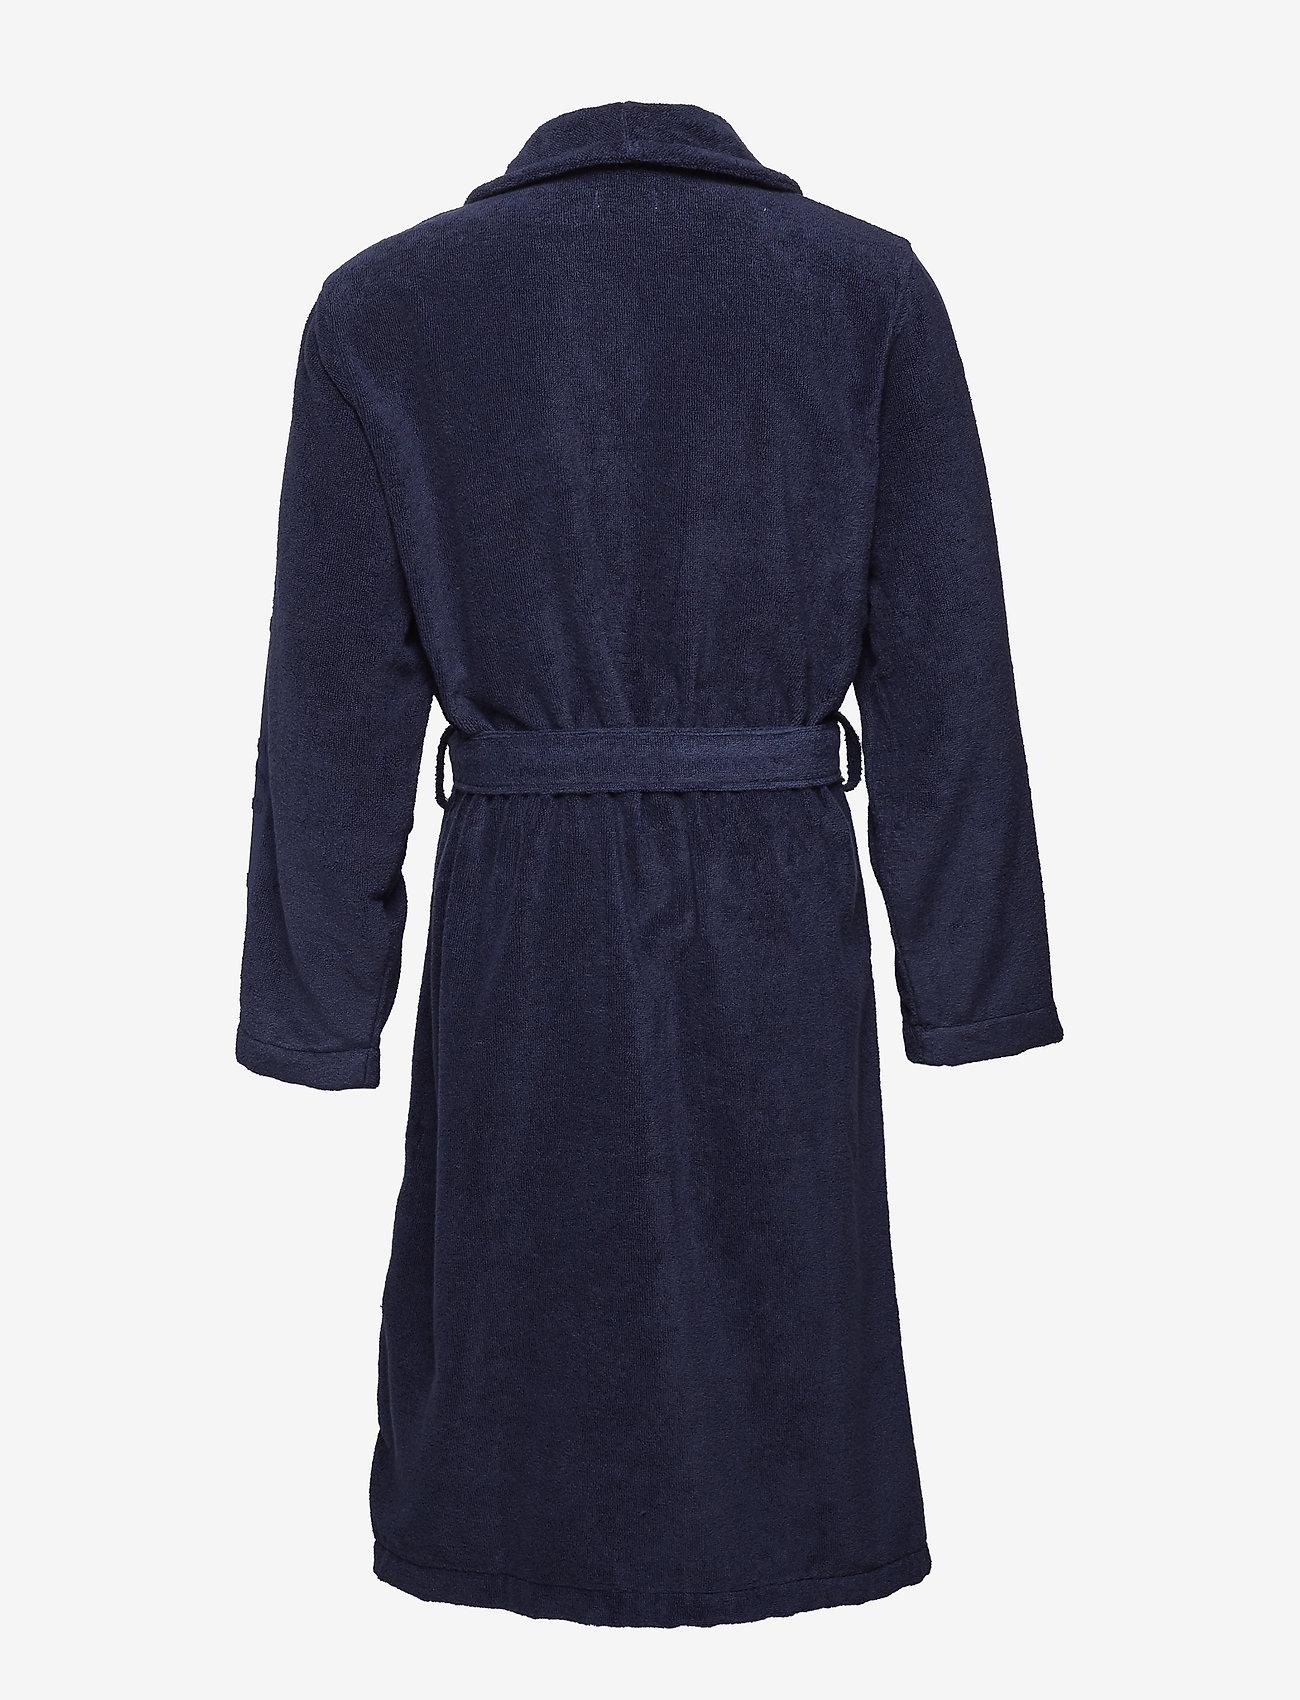 Calvin Klein - ROBE - robes - blue shadow - 1